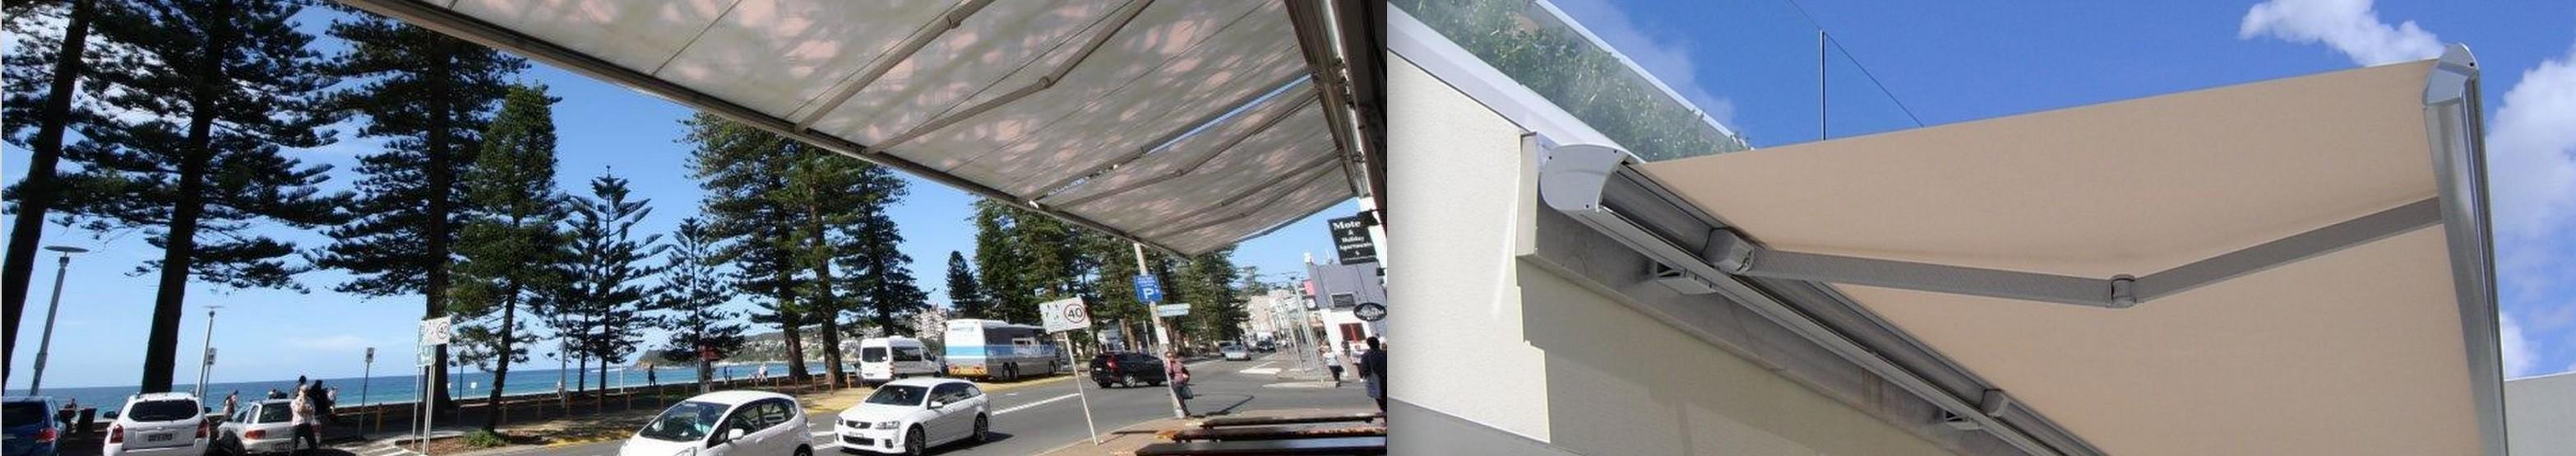 helioshade cassette folding arm awnings banner